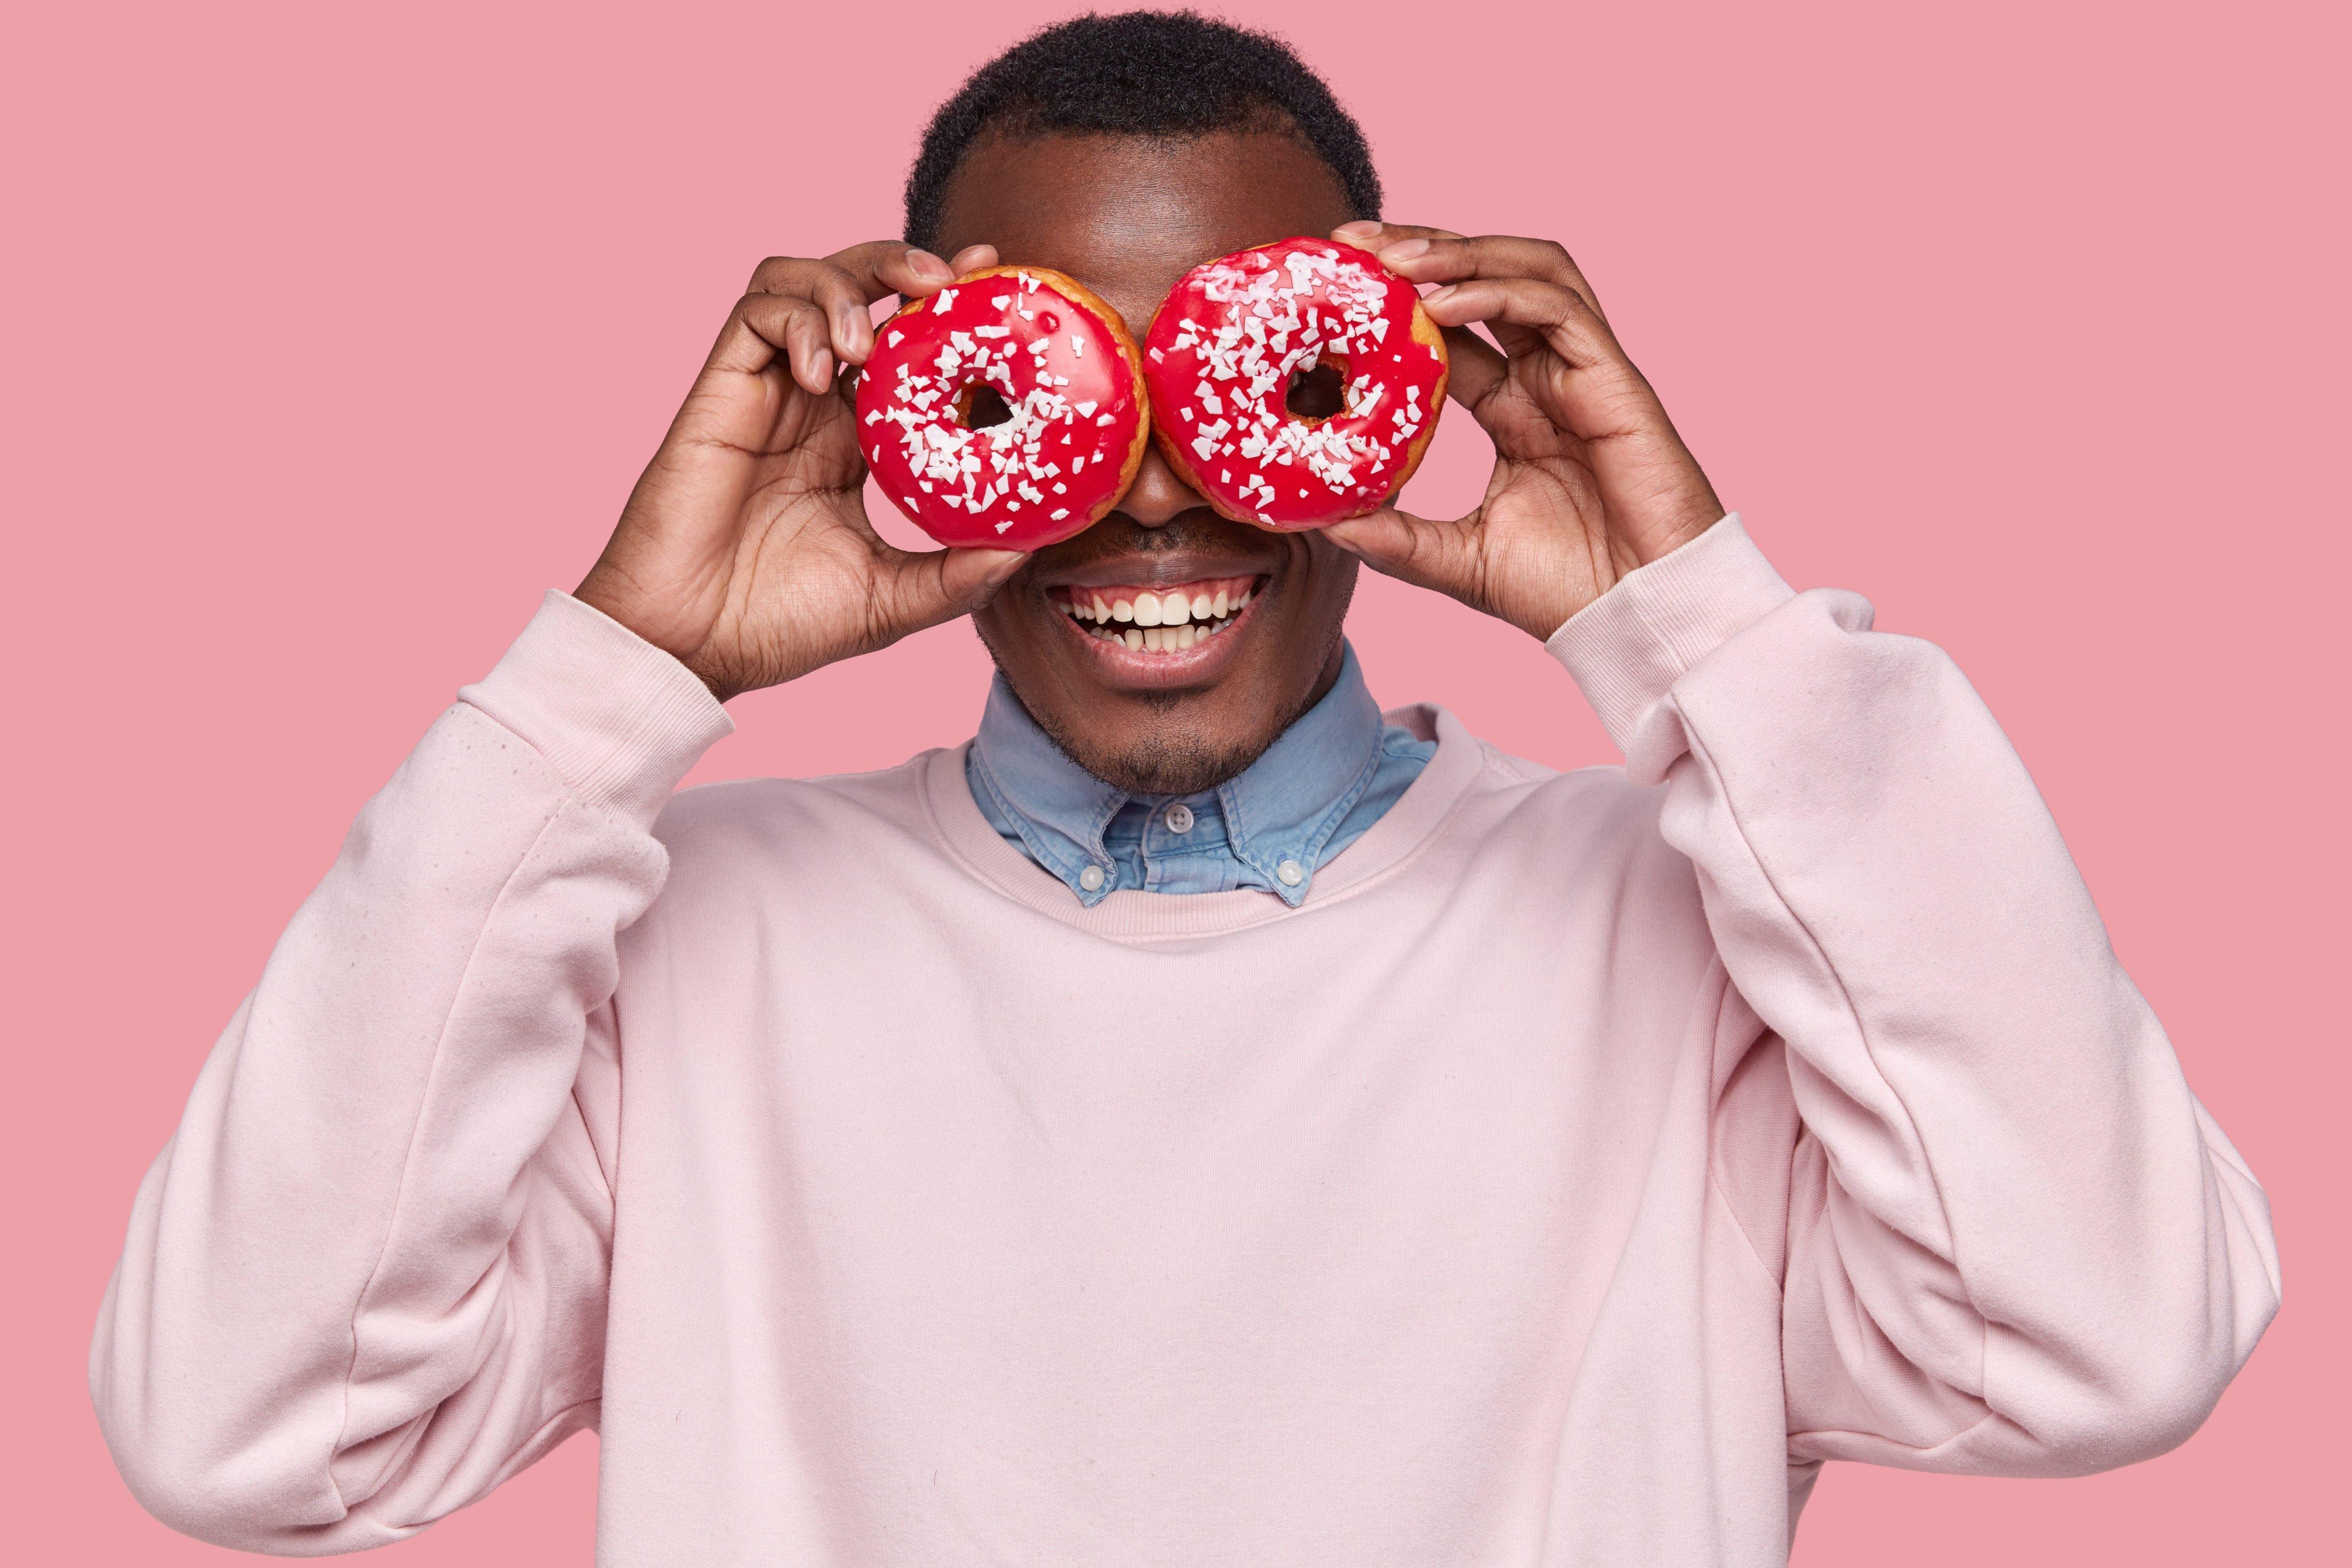 Money talks donut shop